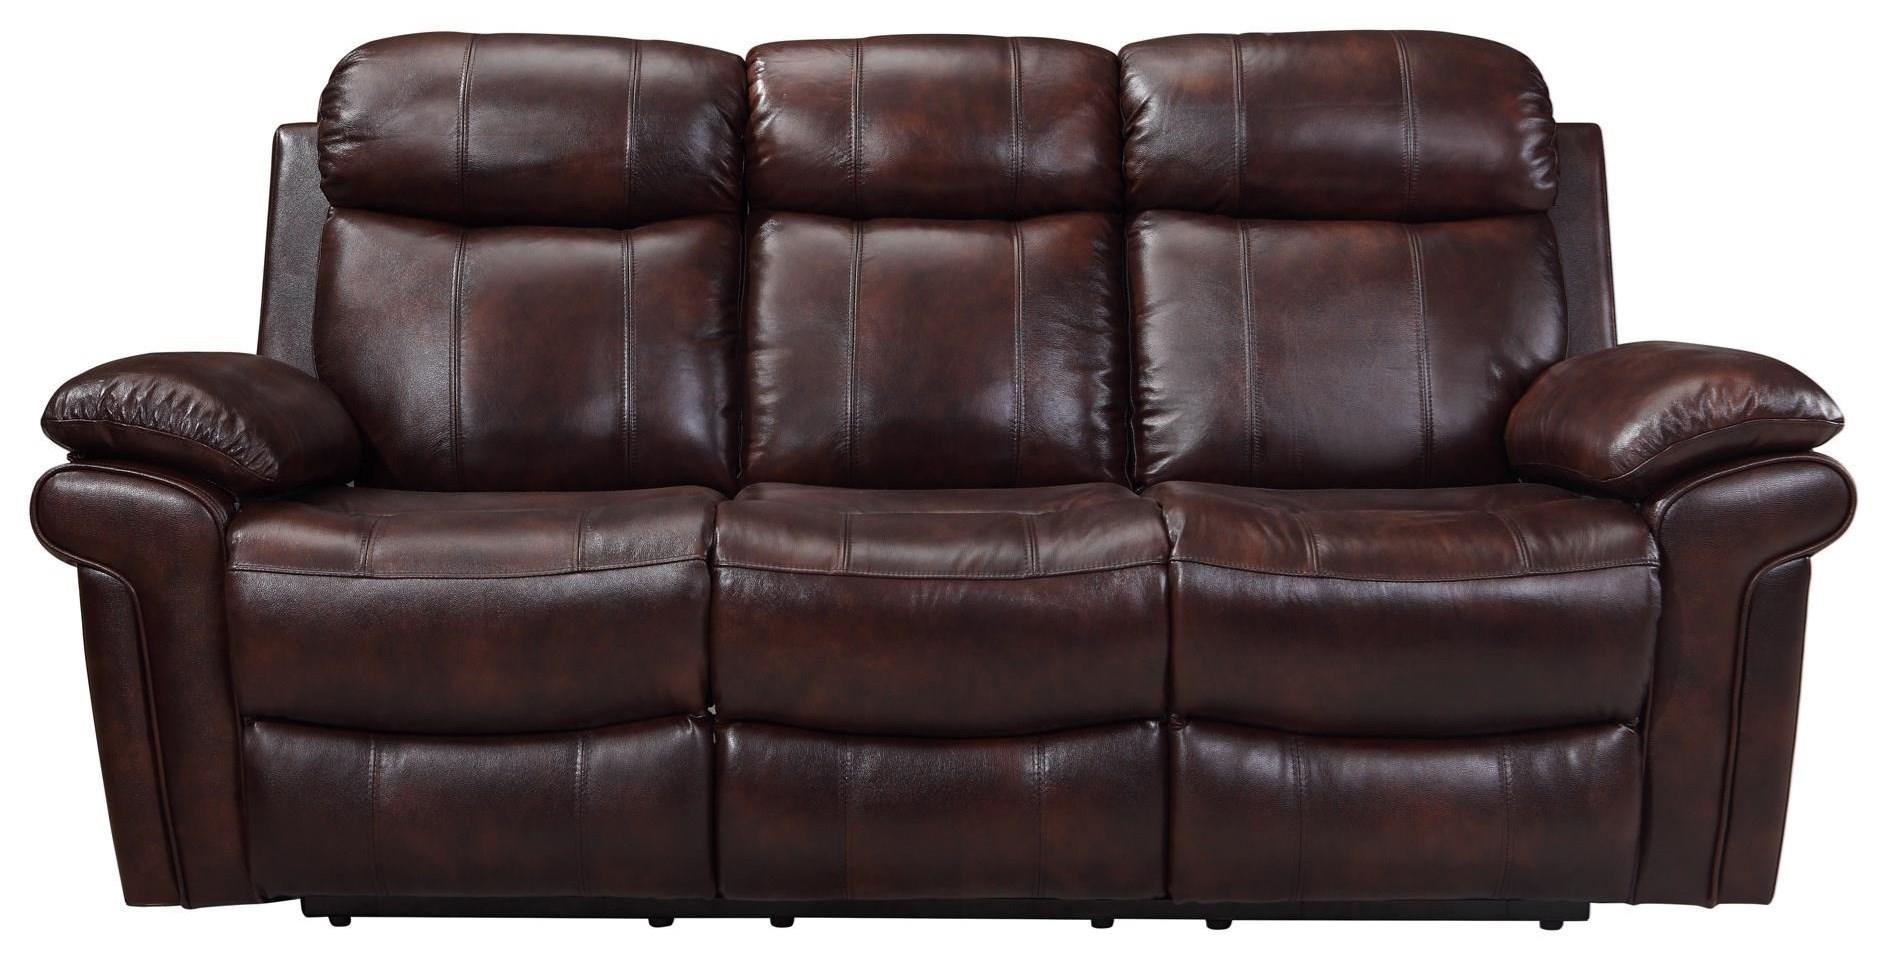 Leather Italia Usa Shae Joplin Power Reclining Sofa